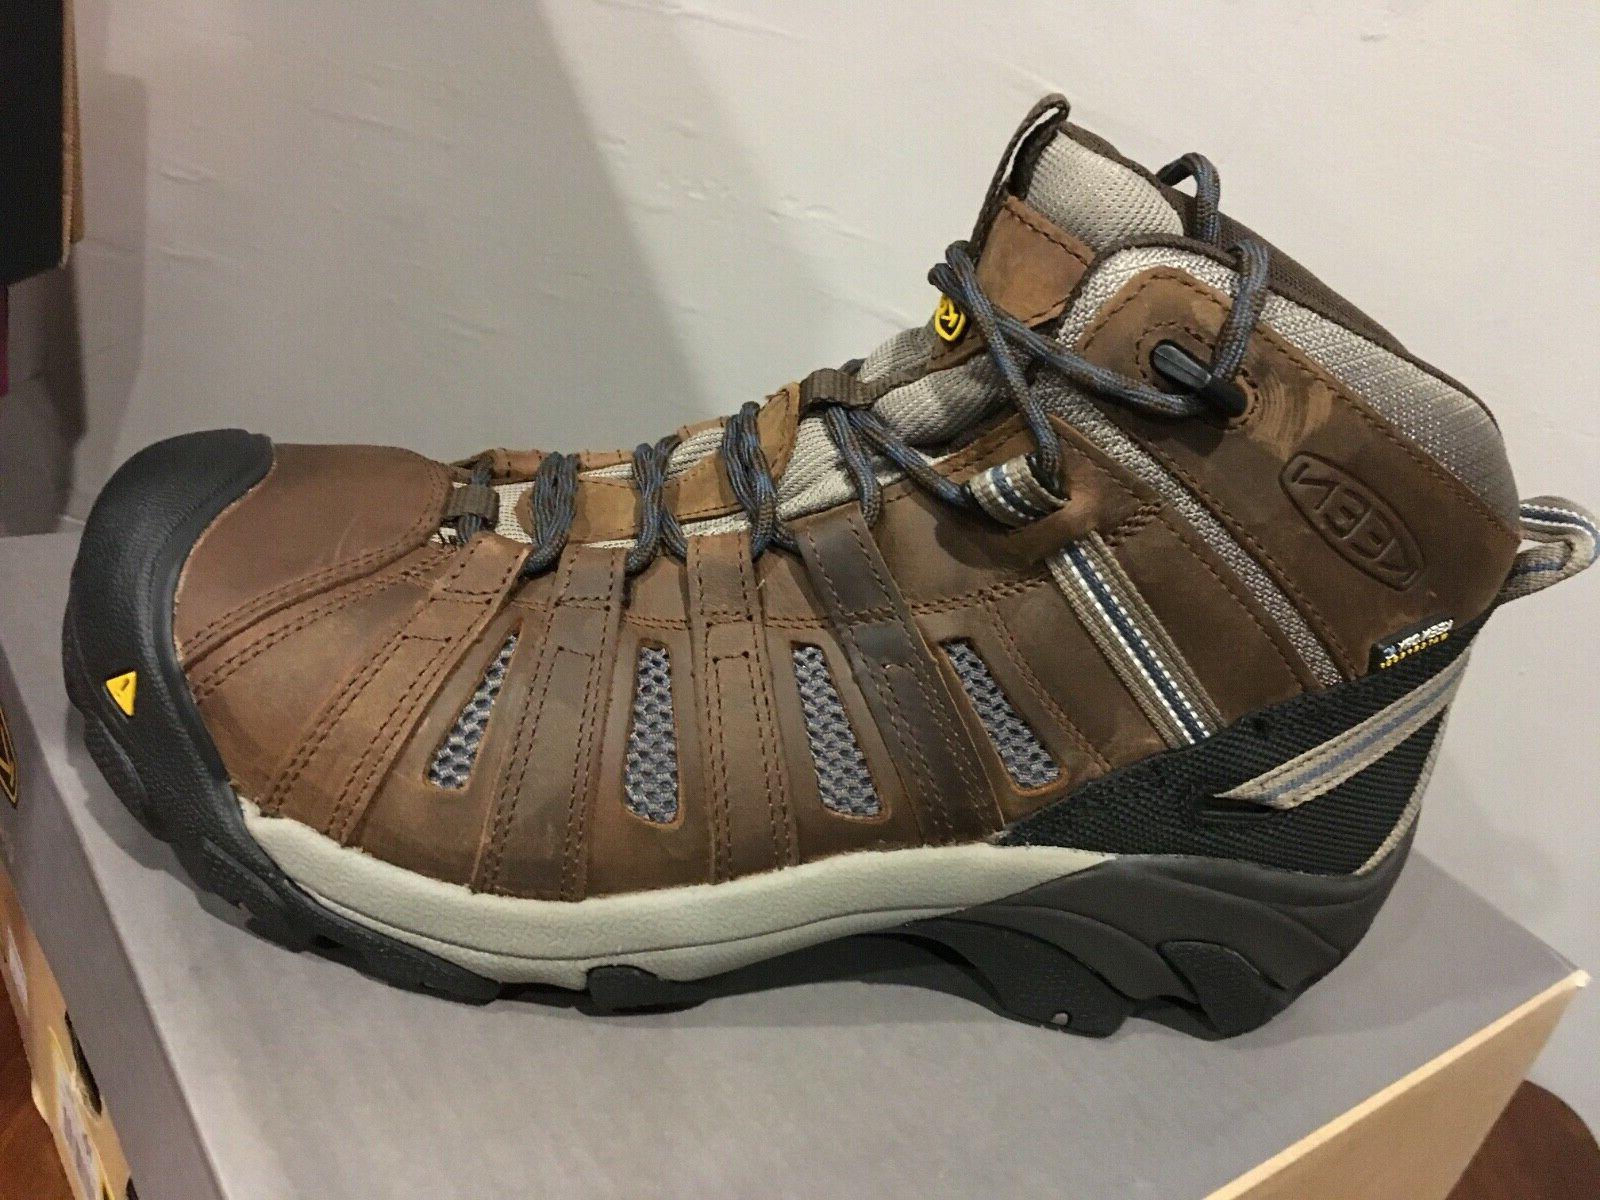 Cody work safety hiker shoe 1021357 wide